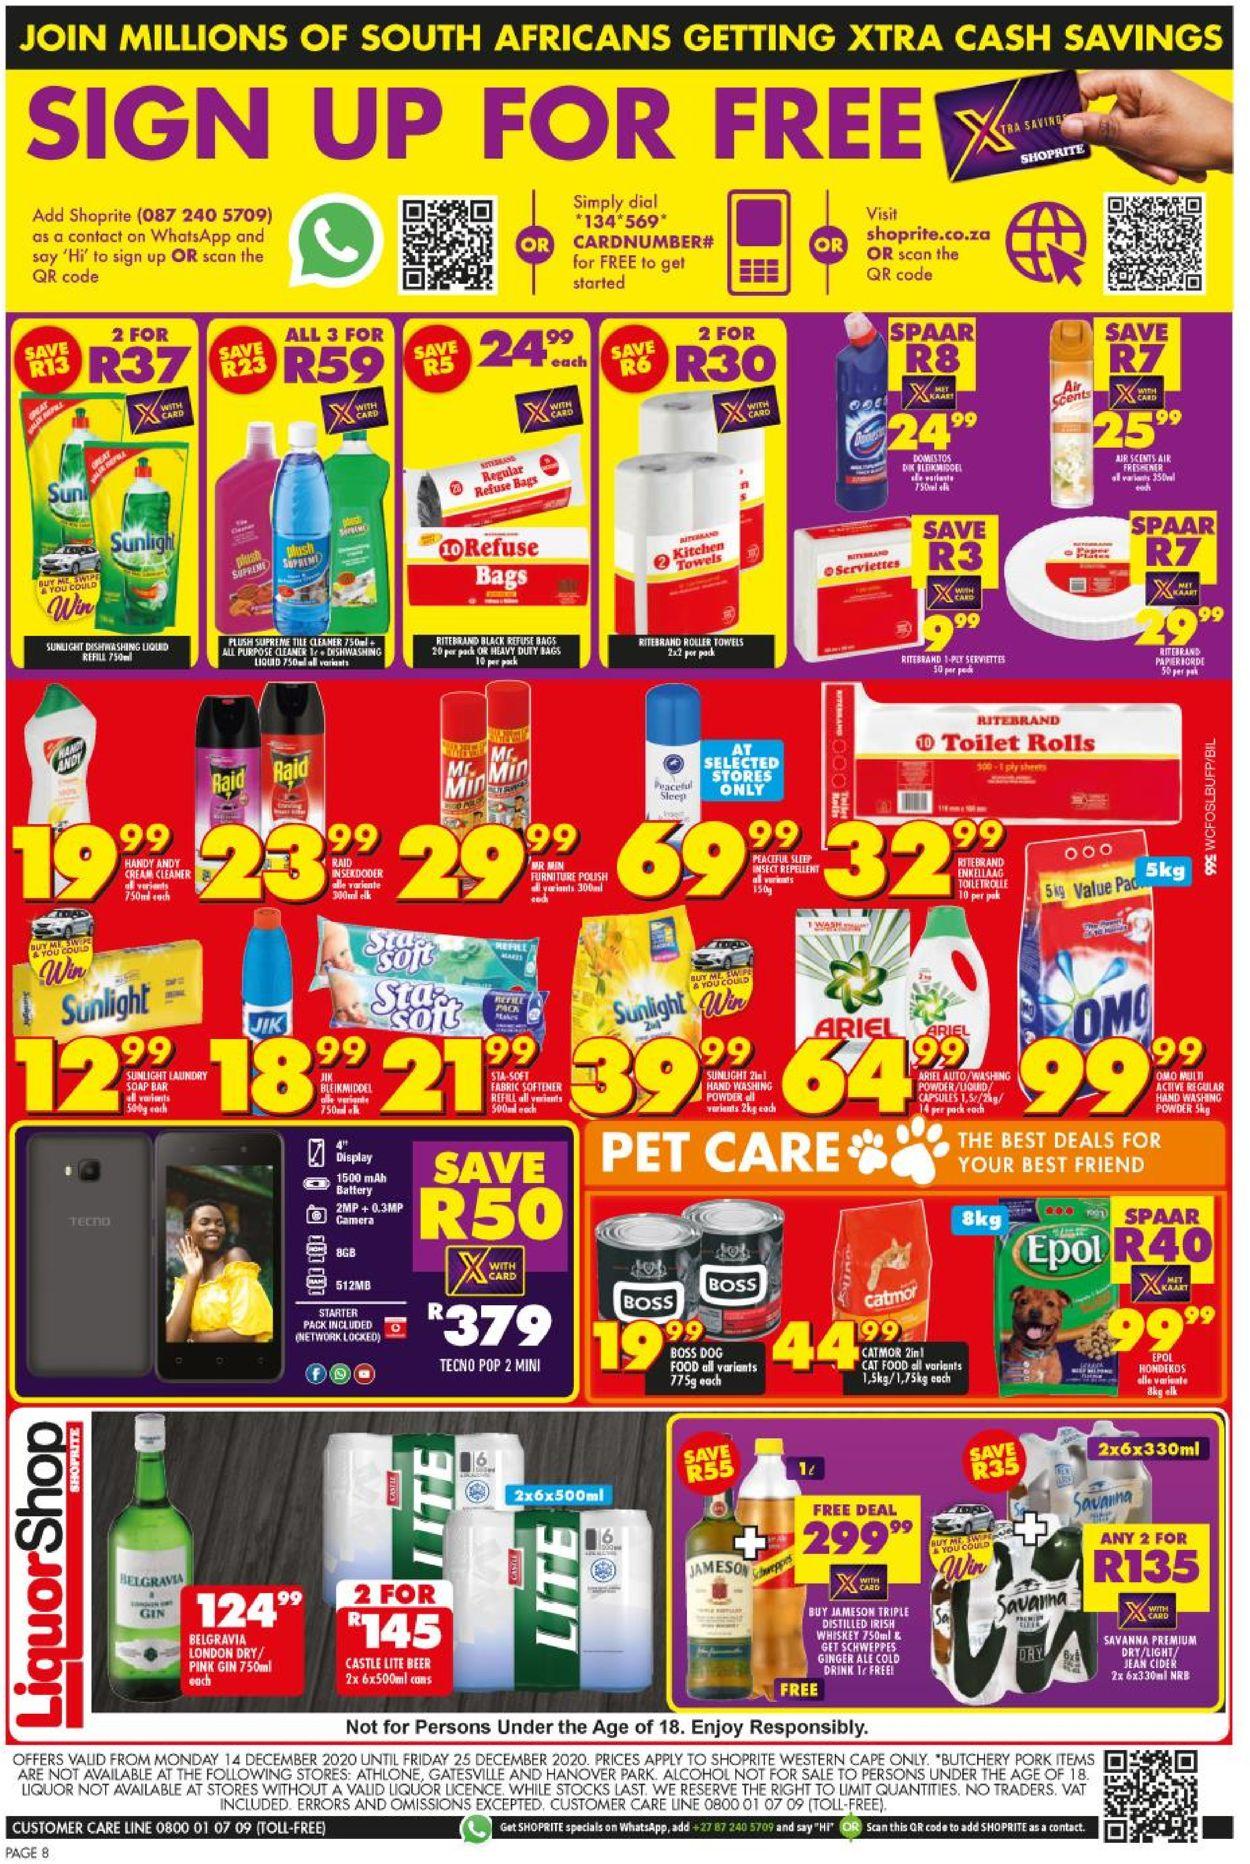 Shoprite Christmas Savings 2020 Catalogue - 2020/12/14-2020/12/25 (Page 7)